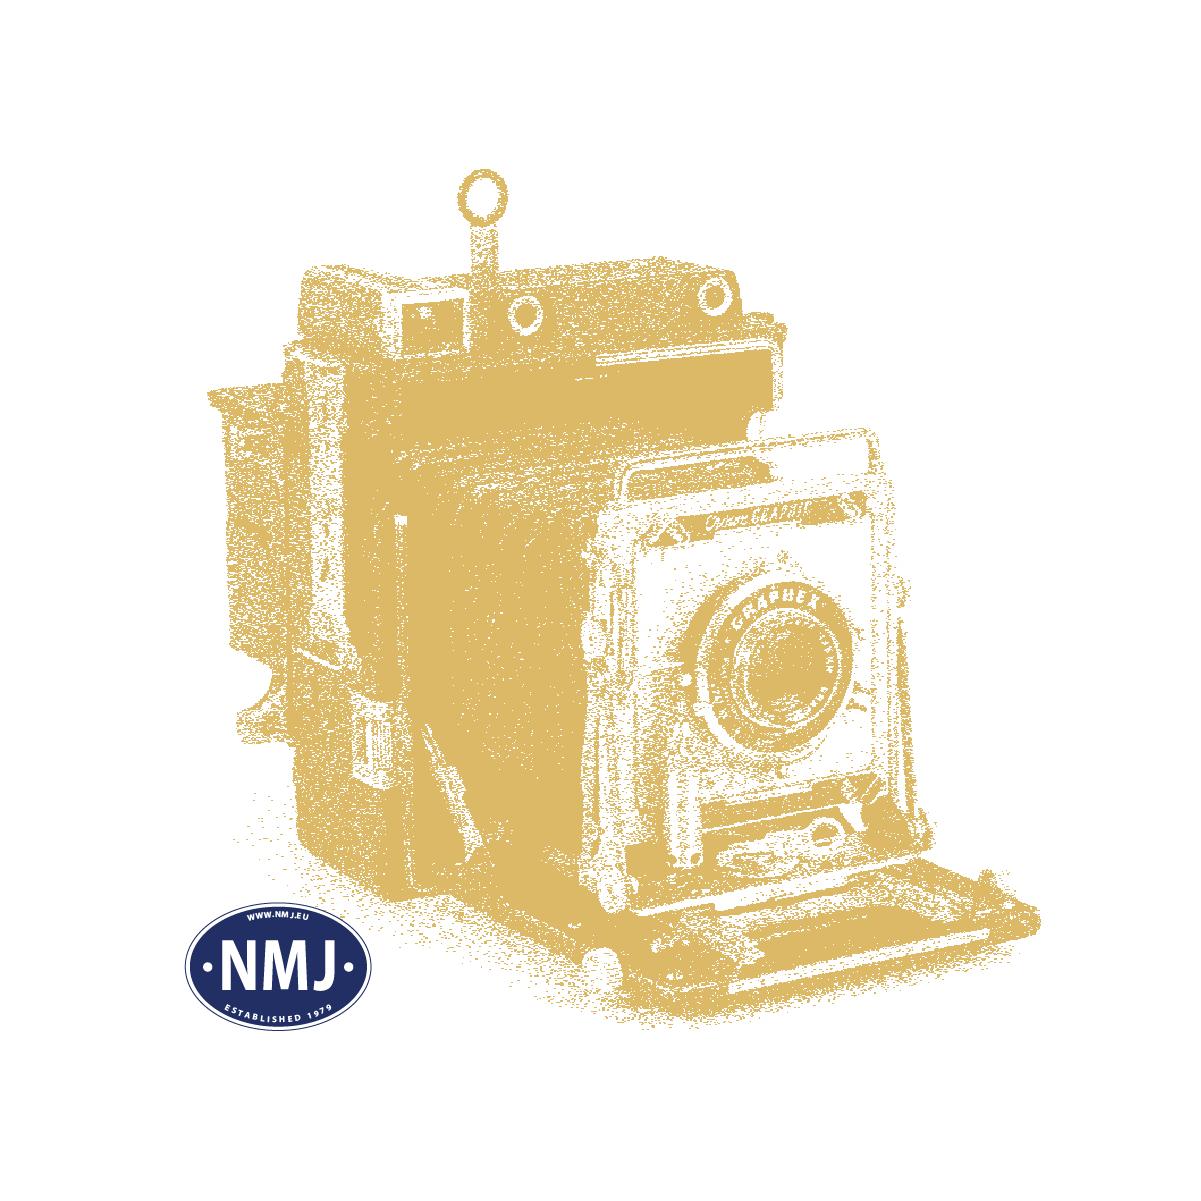 NMJT95402 - NMJ Topline SNCB 5320, AC Digital